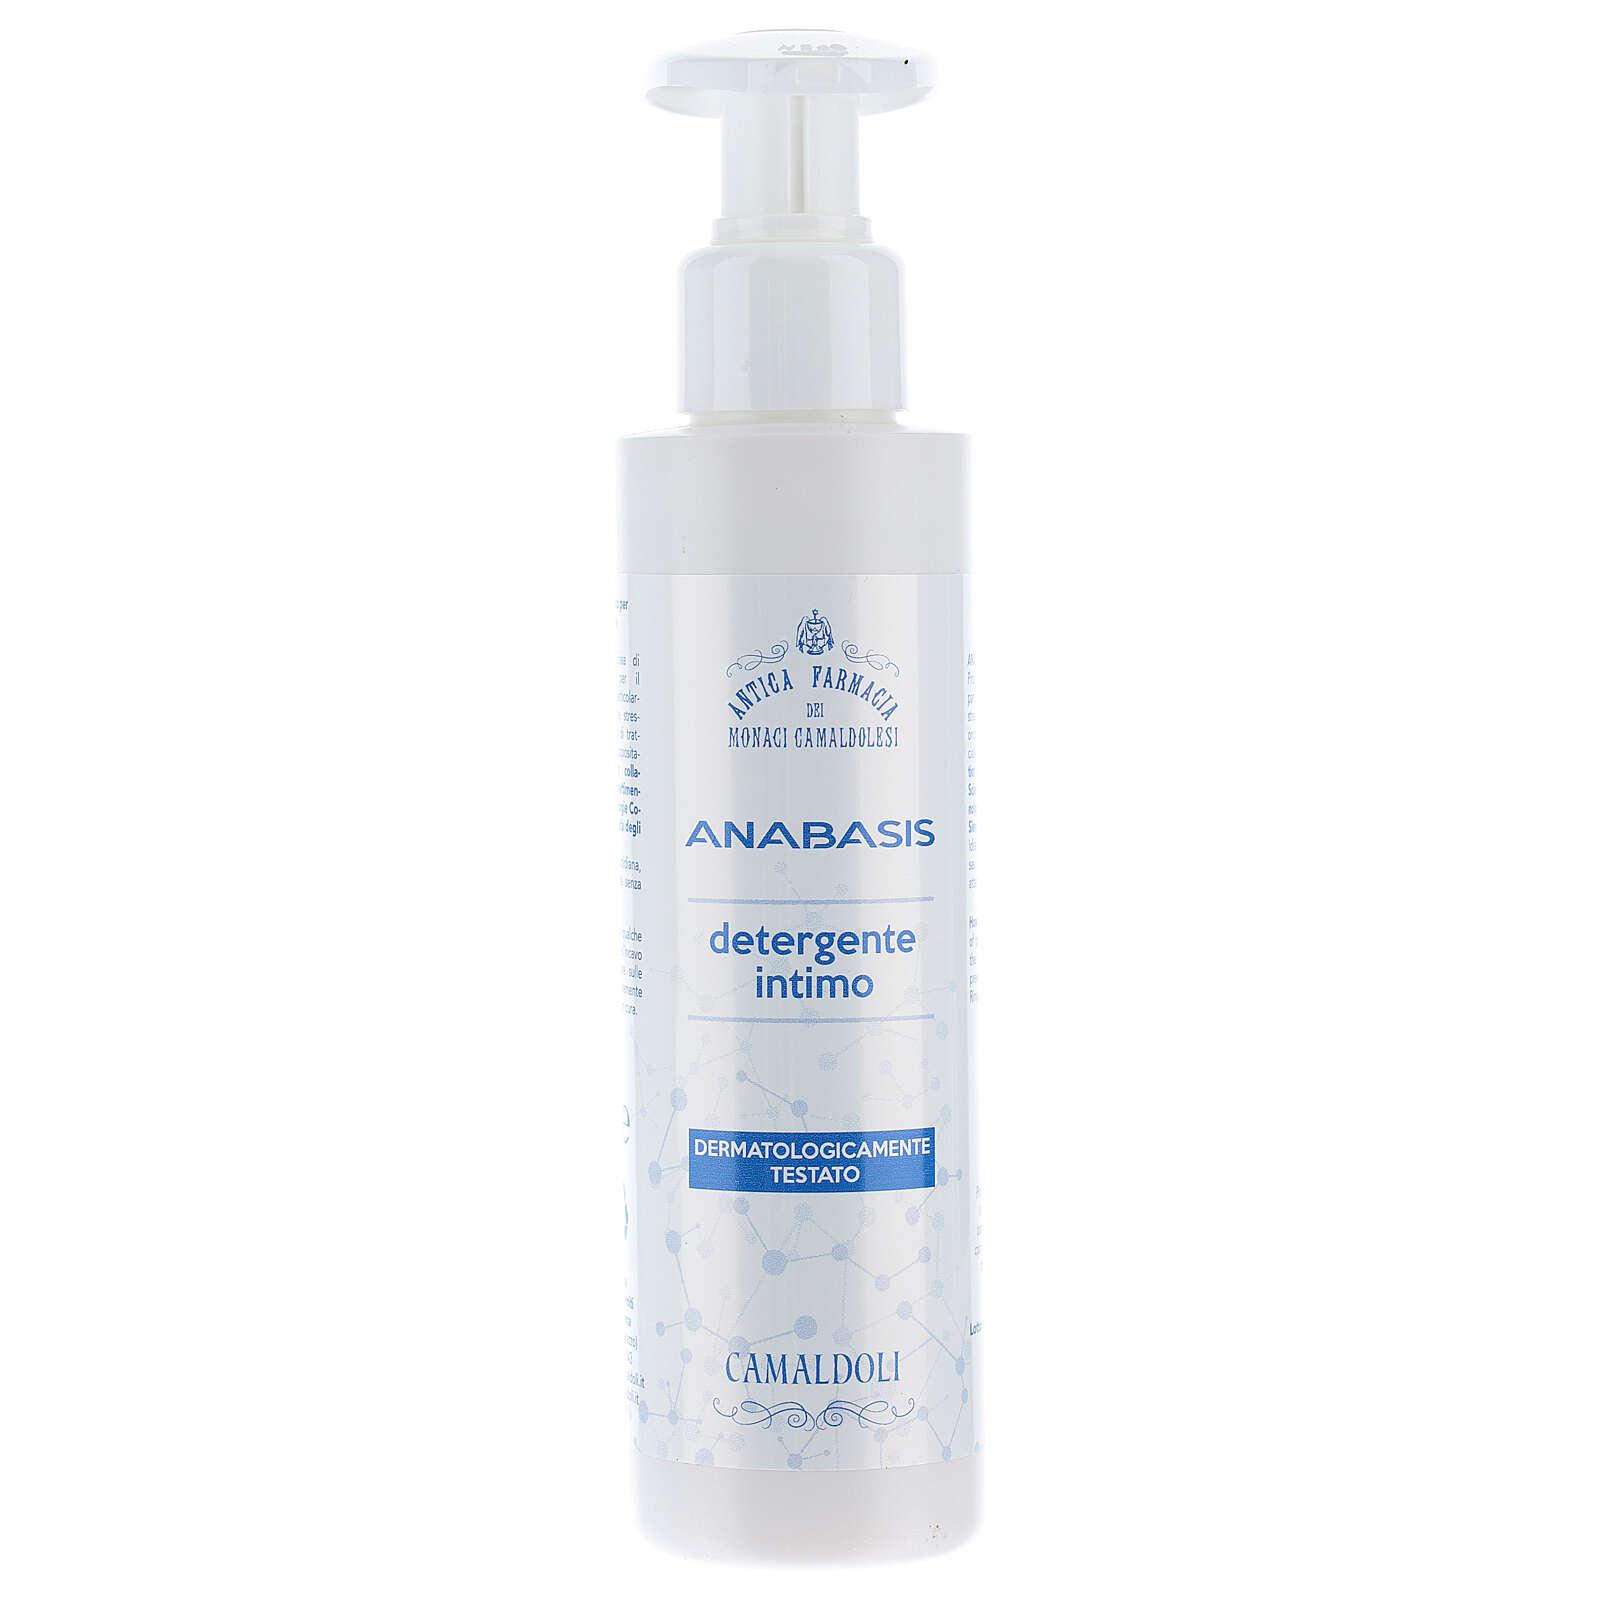 Detergente intimo 150 ml Camaldoli linea Anabasis 4